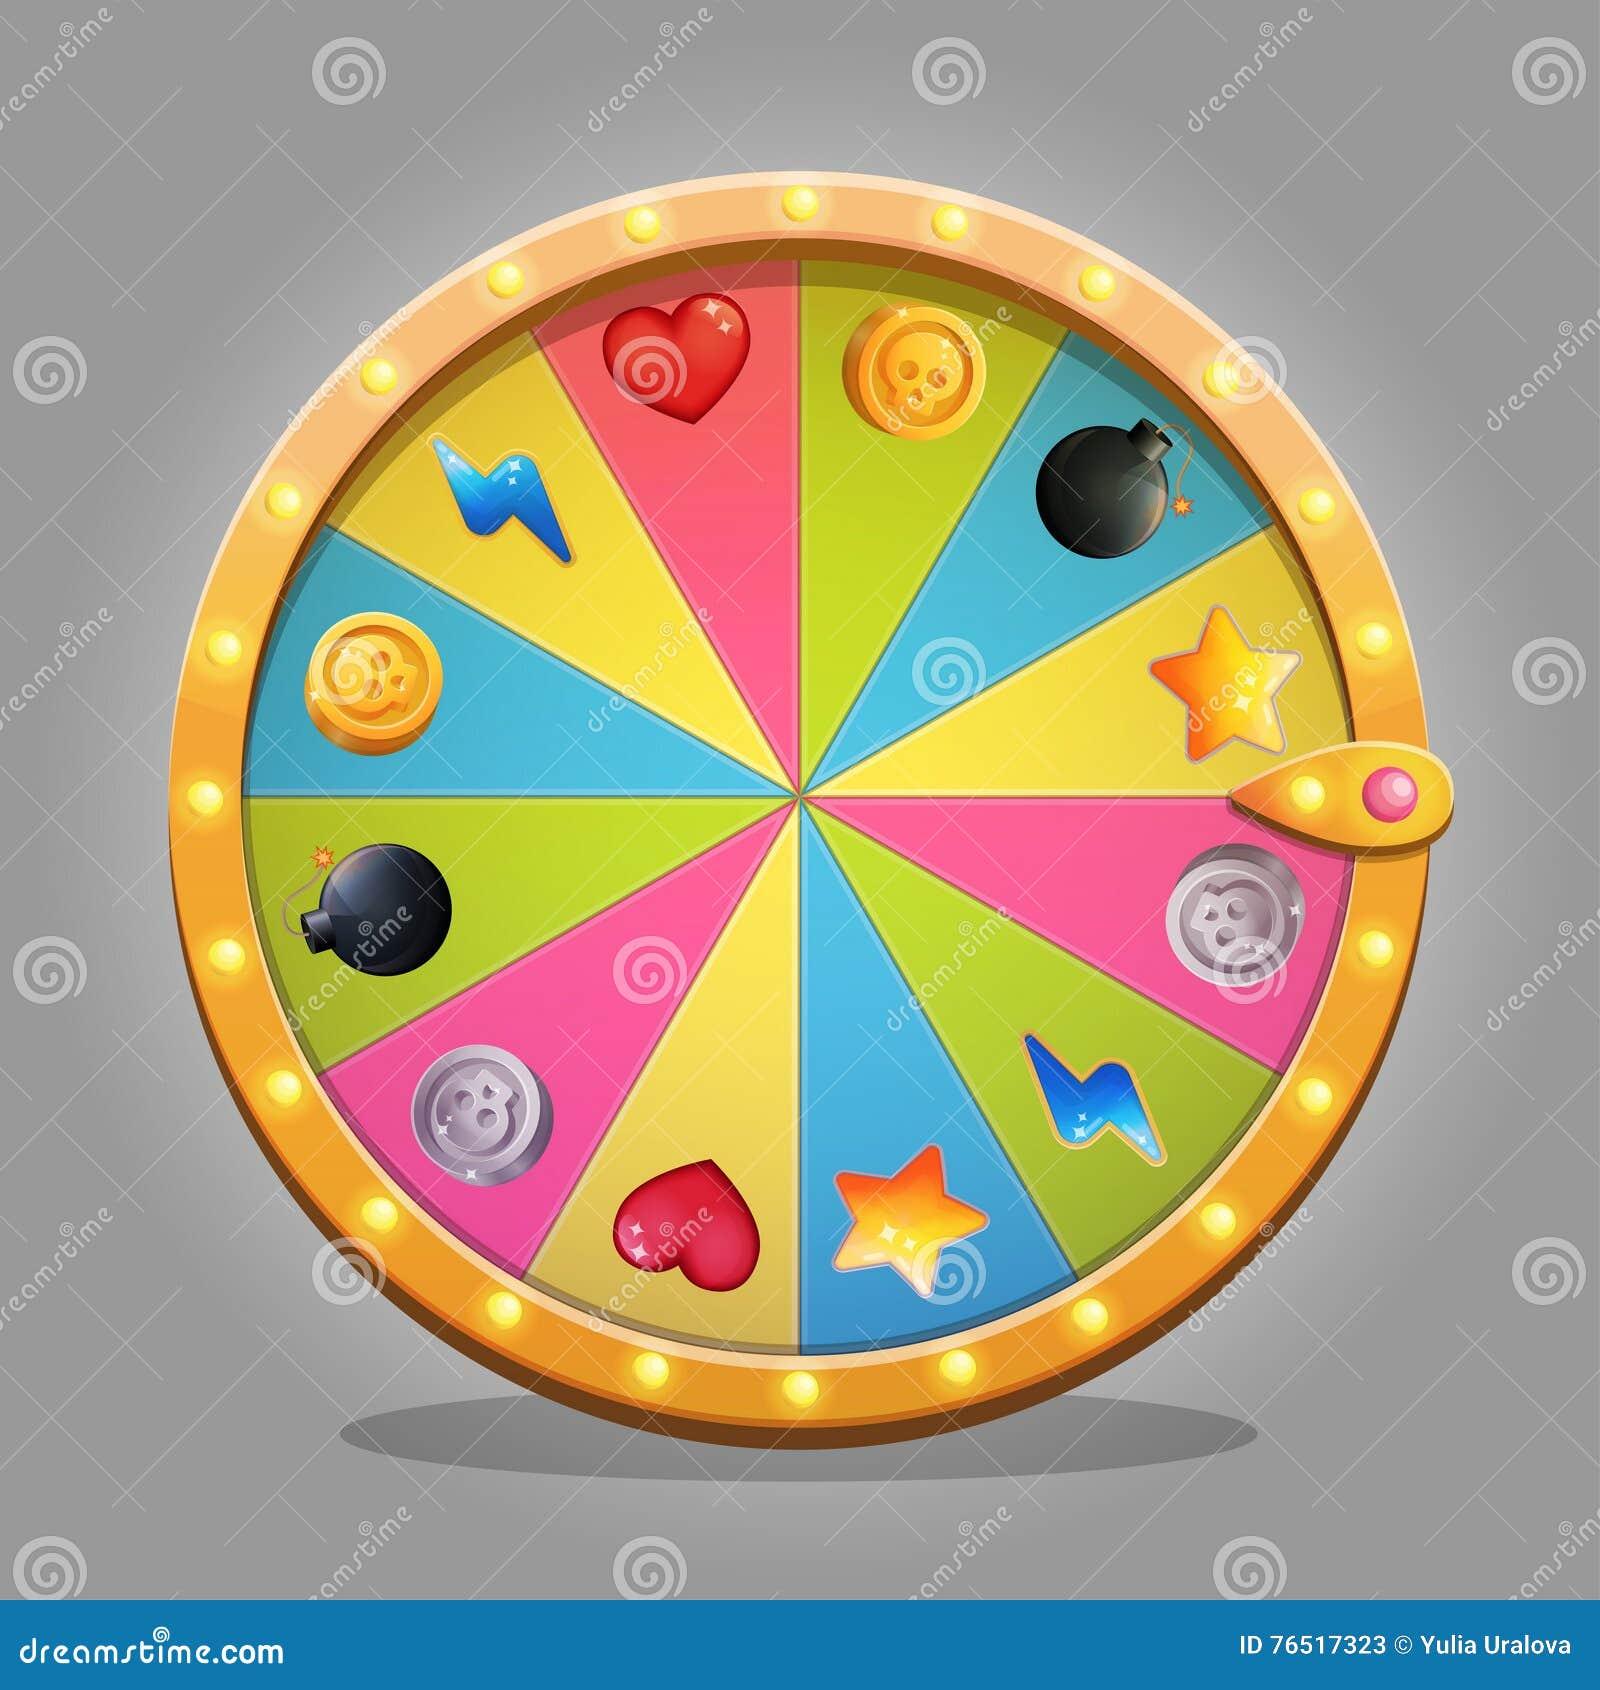 Fortune Wheel Design Element Stock Vector - Illustration